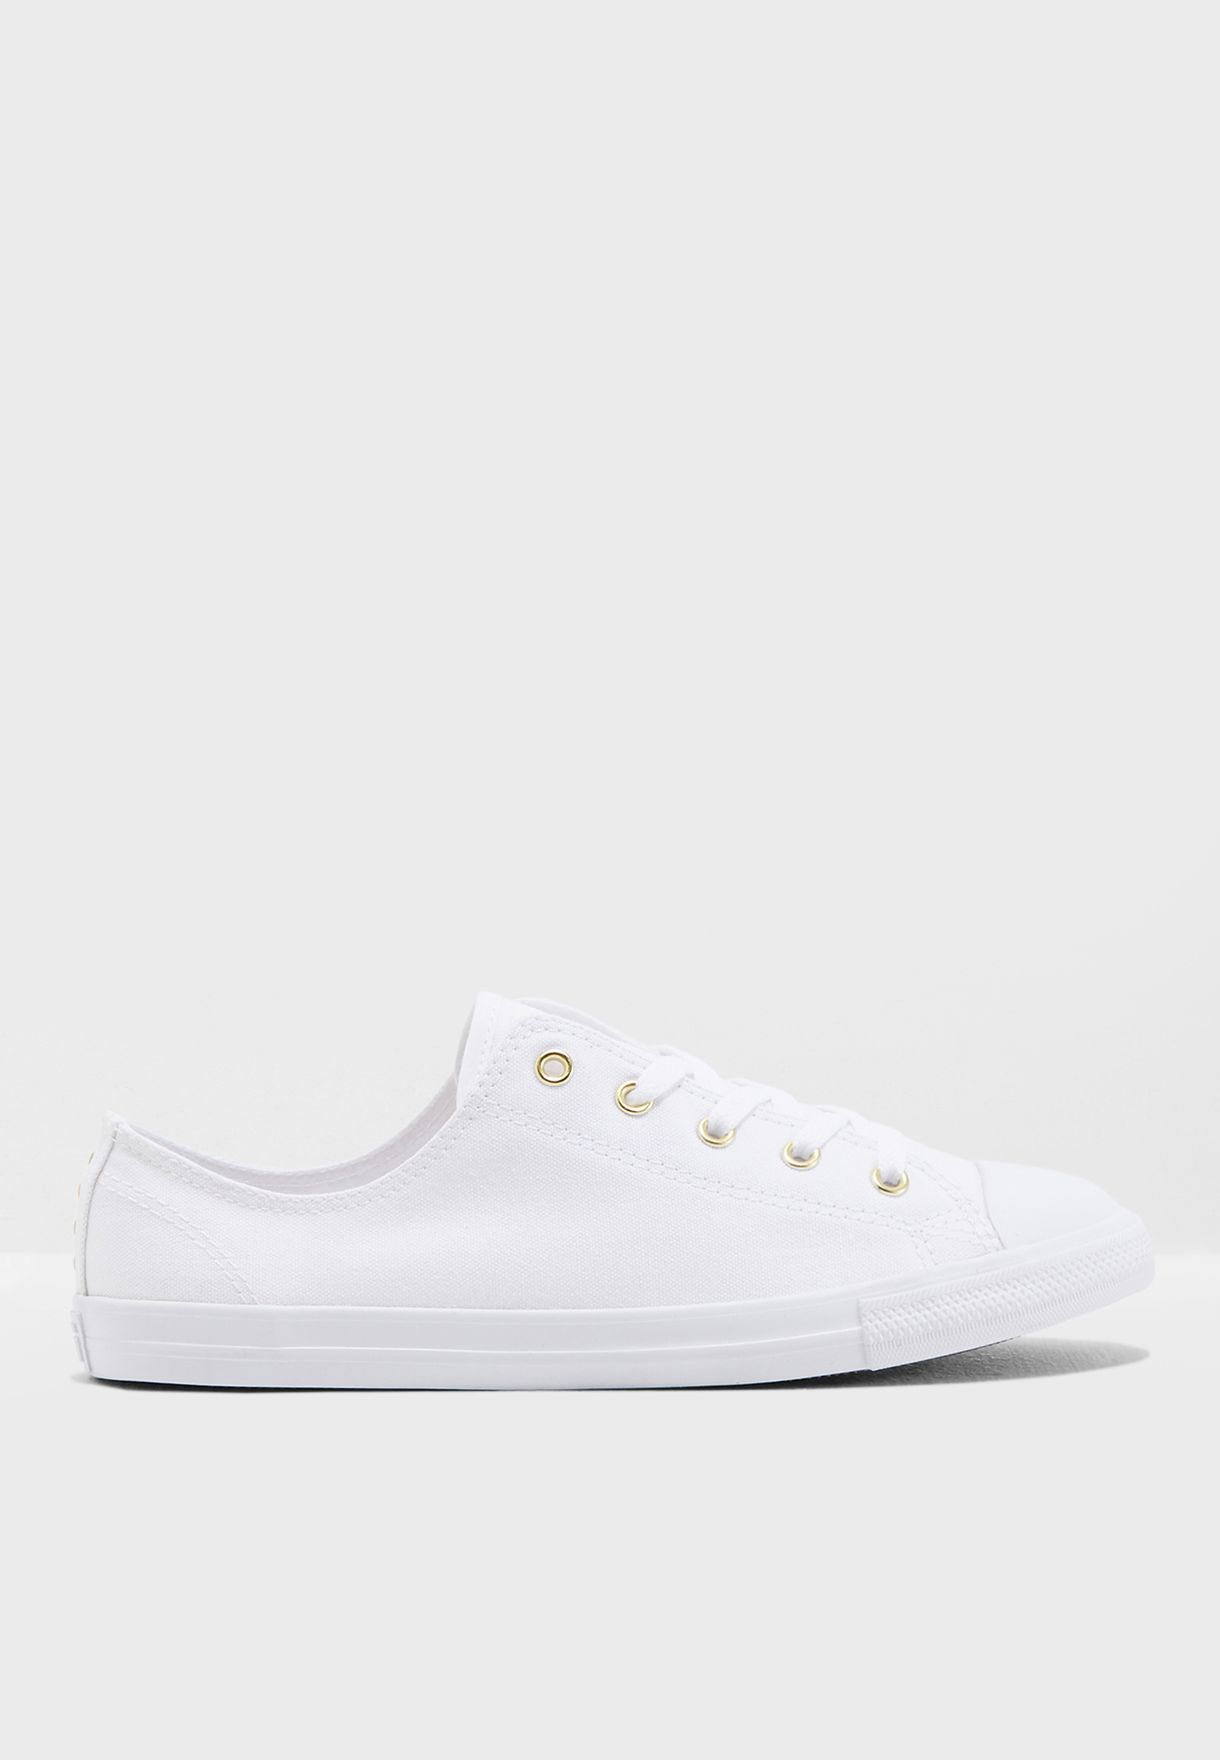 e51b293b2d1d Shop Converse white Chuck Taylor All Star Dainty 561644C-102 for ...